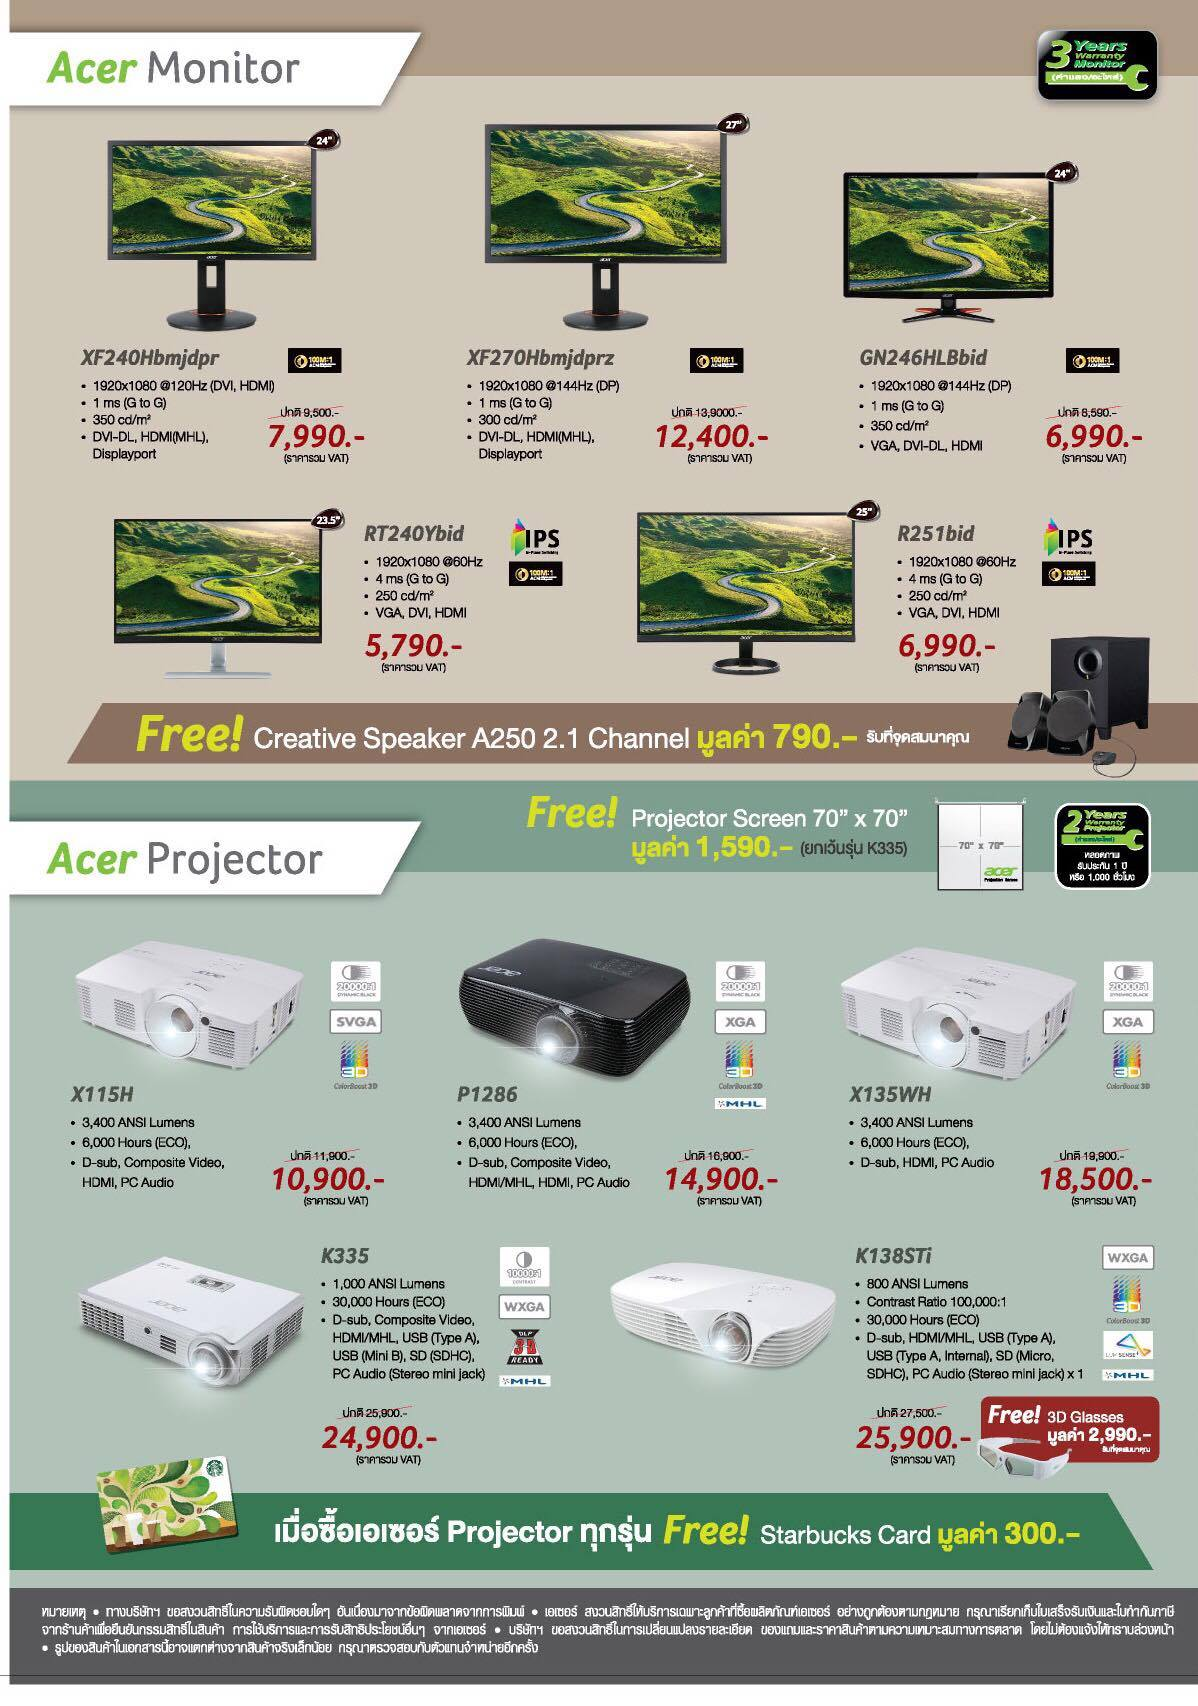 Acer-Commart-Work-2016-SpecPhone-00004